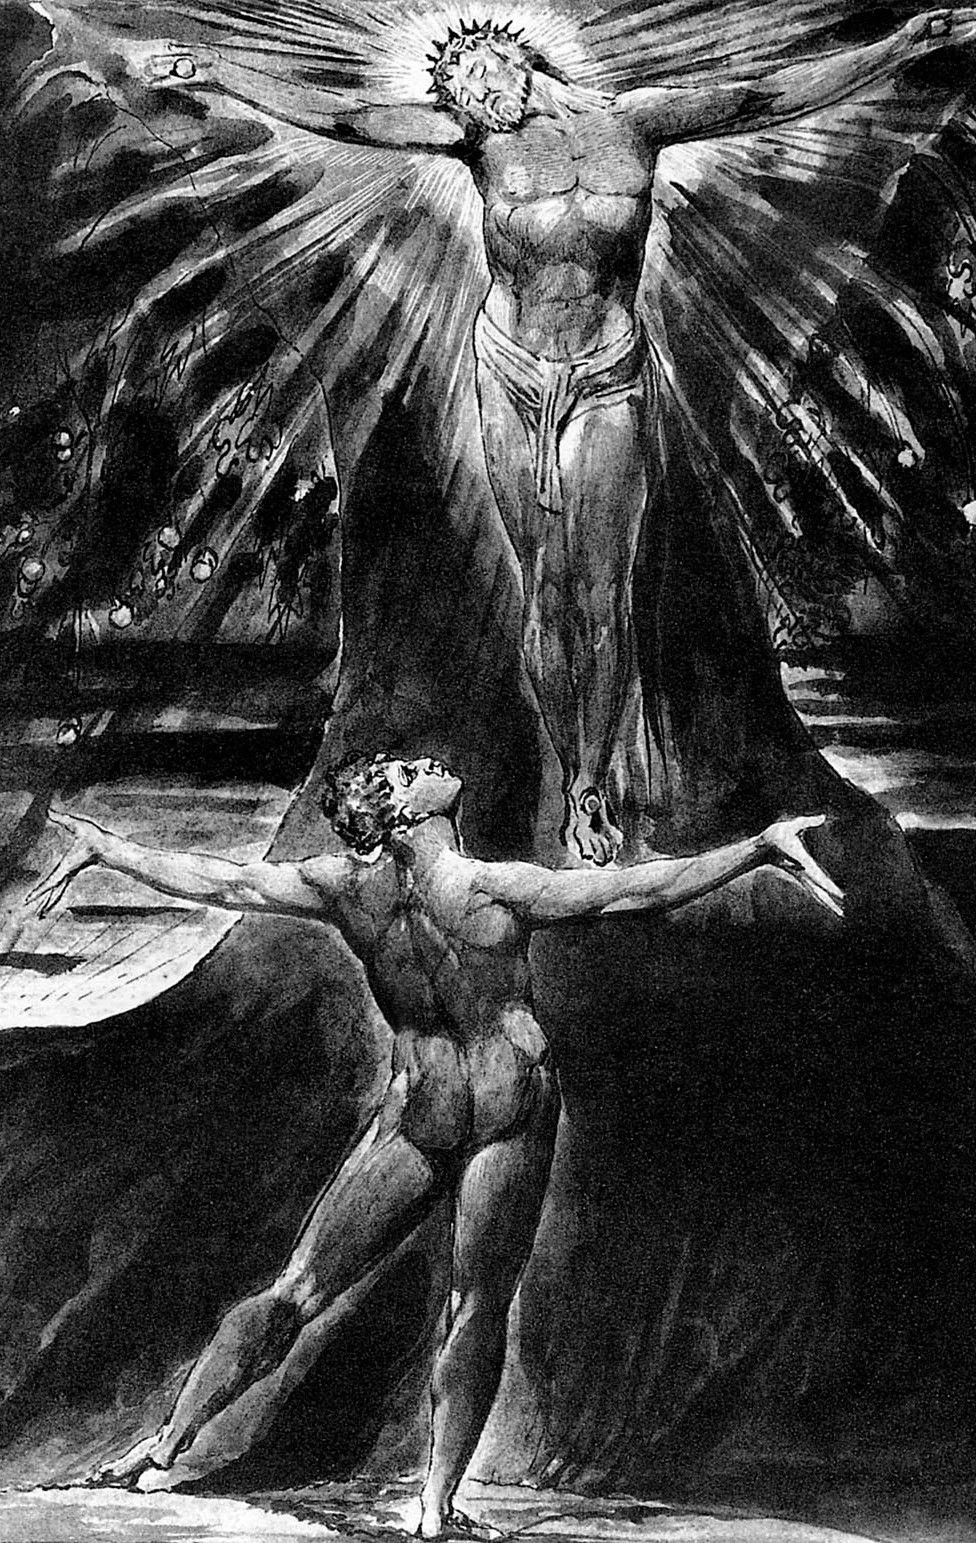 Albion contemplating Jesus crucified in William Blake's engraved poem Jerusalem